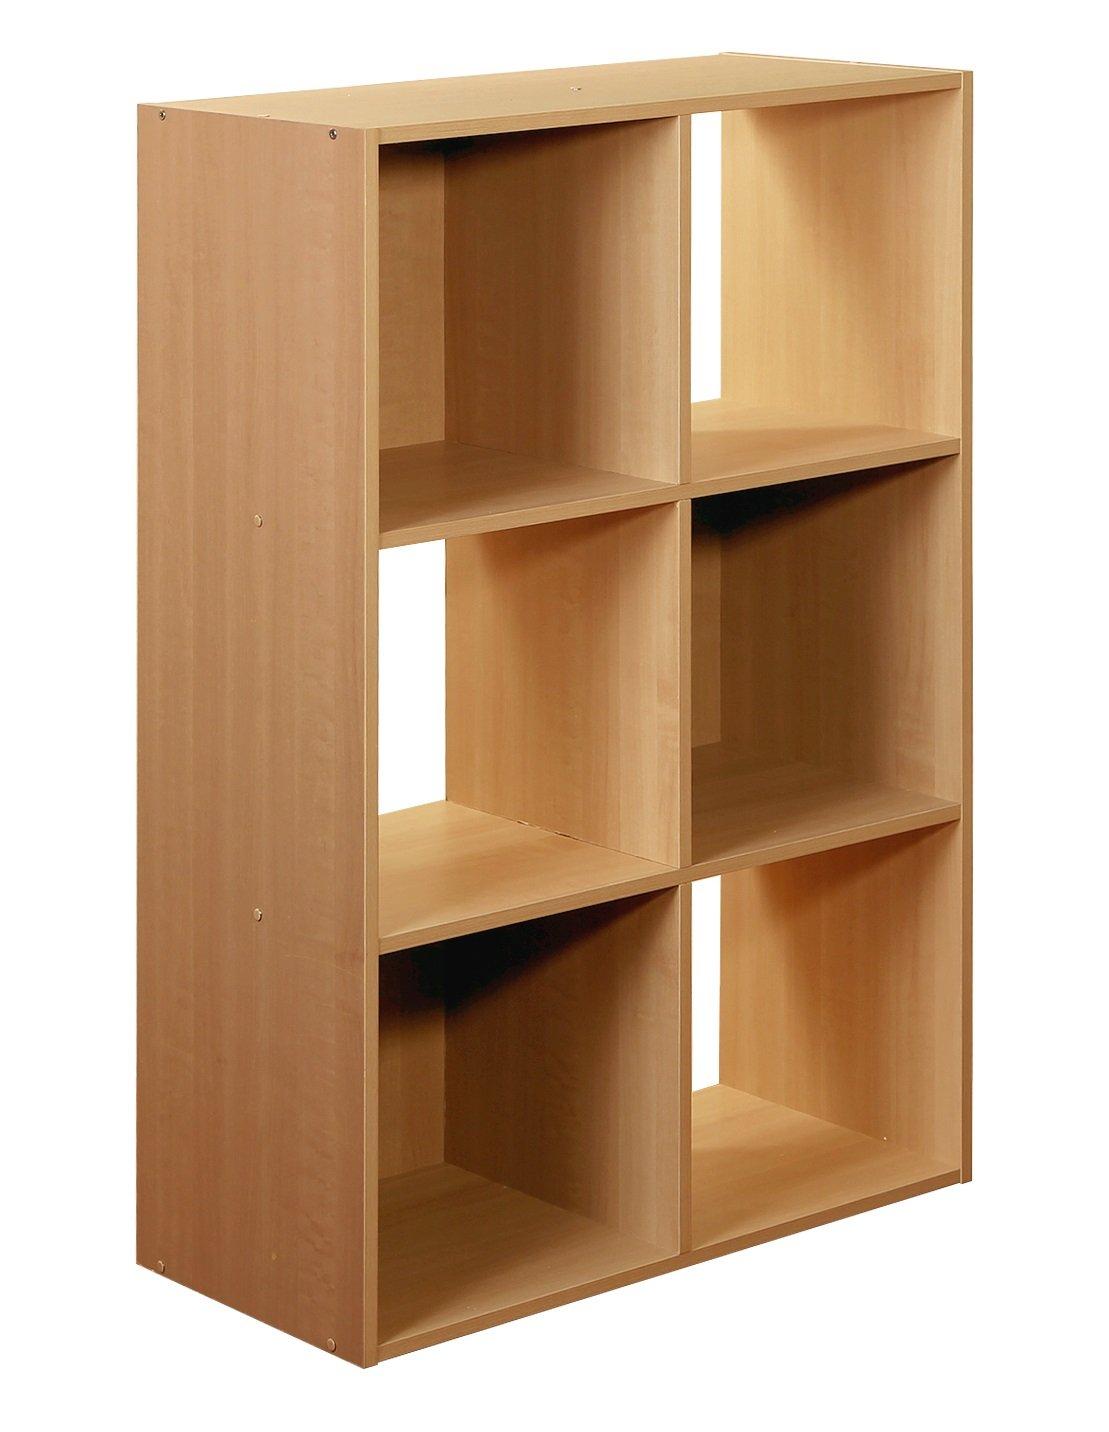 6-Cube Organizer, Maple